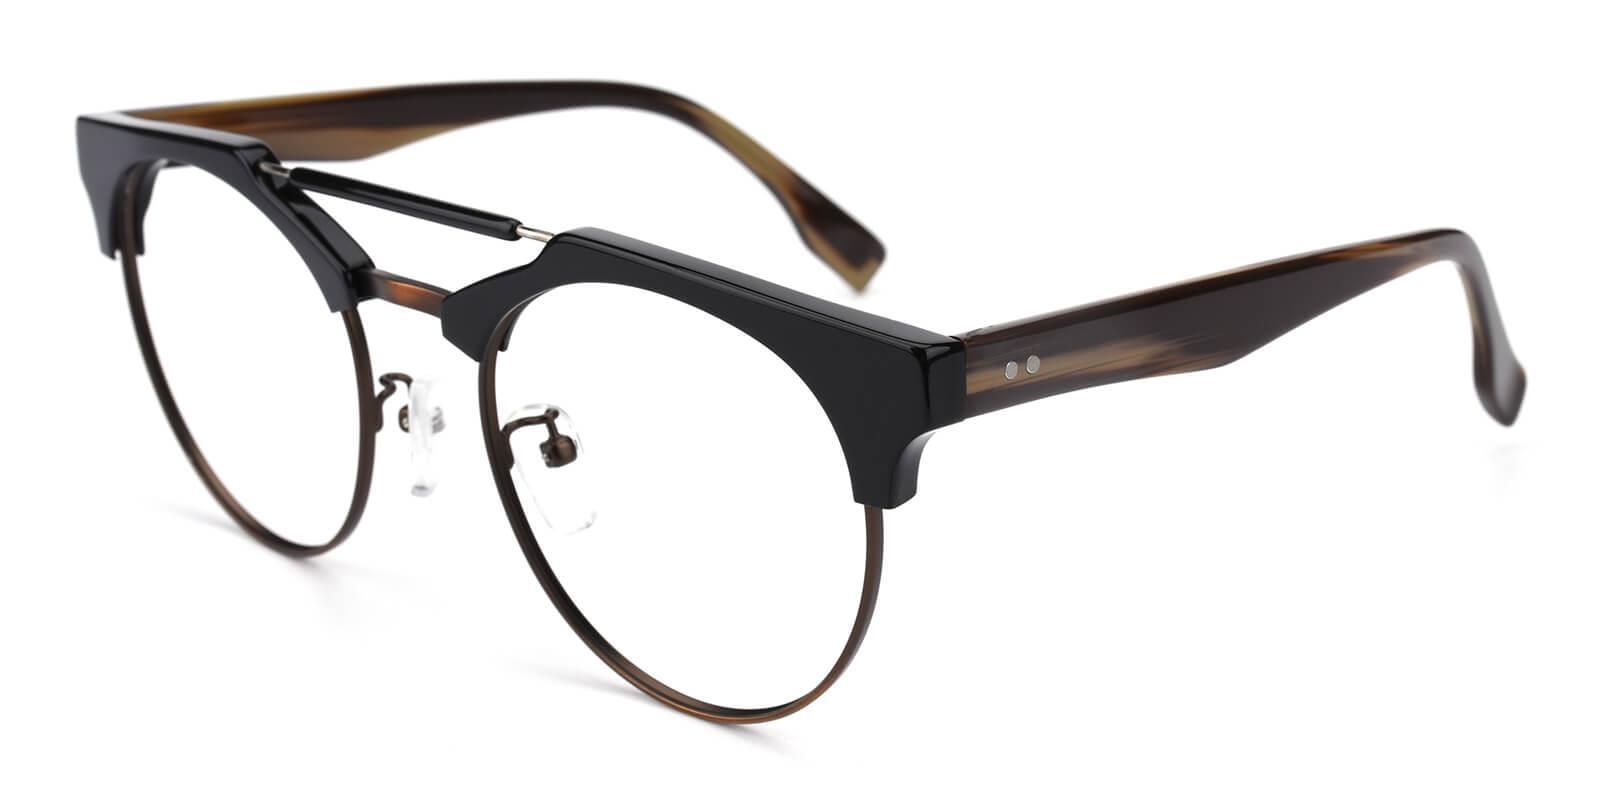 Ombama-Brown-Browline-Combination-Eyeglasses-additional1